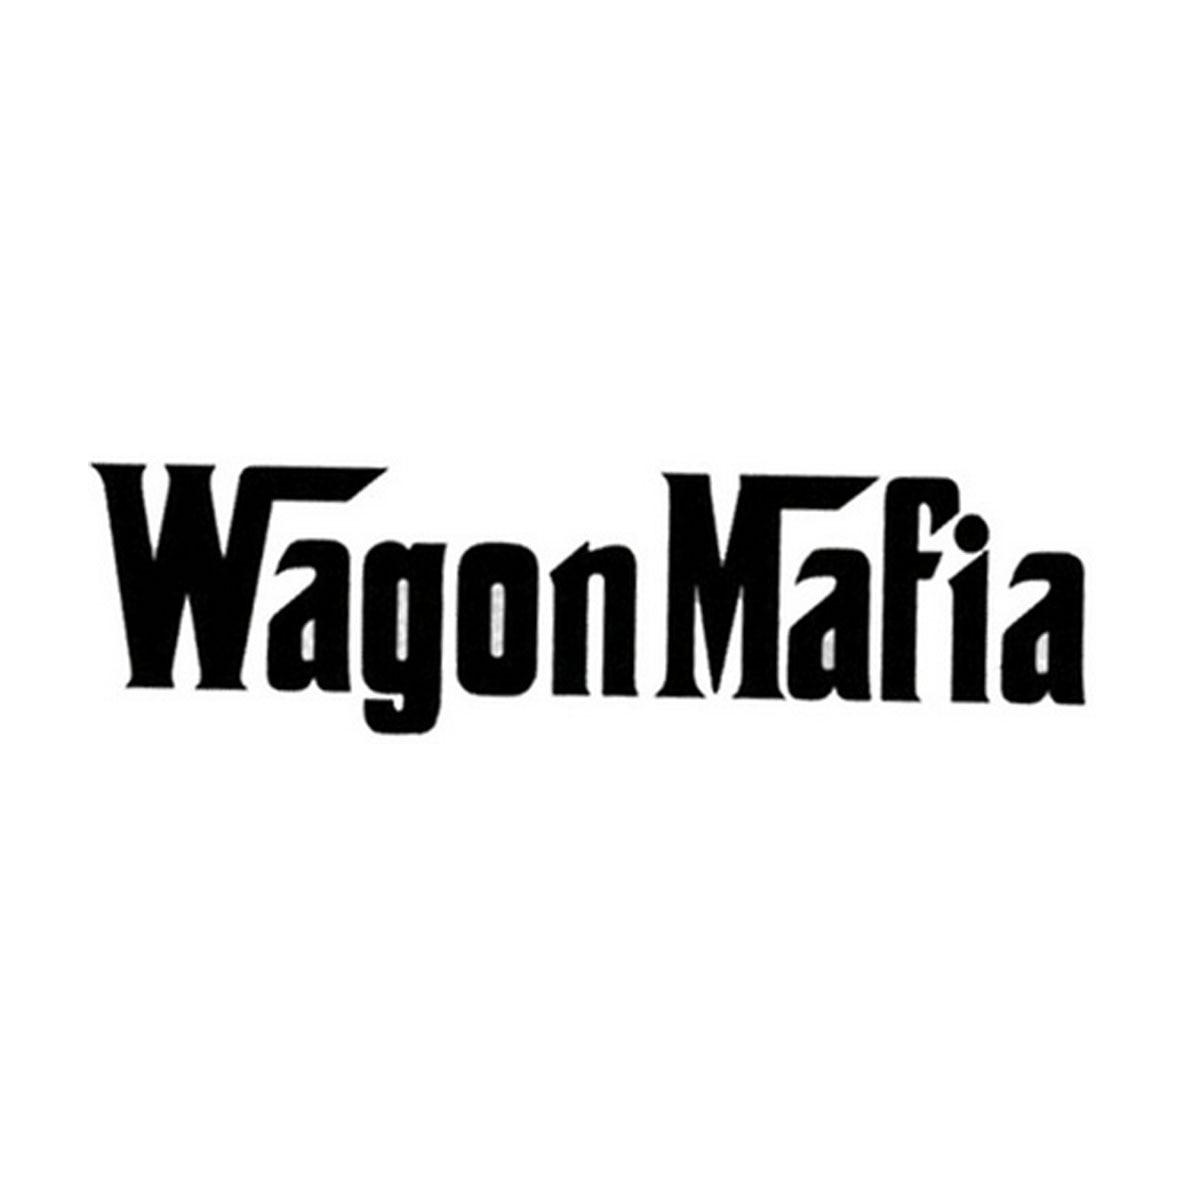 The First Wagon Mafia Decal Car Window Bumper Auto Vinyl Sticker Door Wall Decor